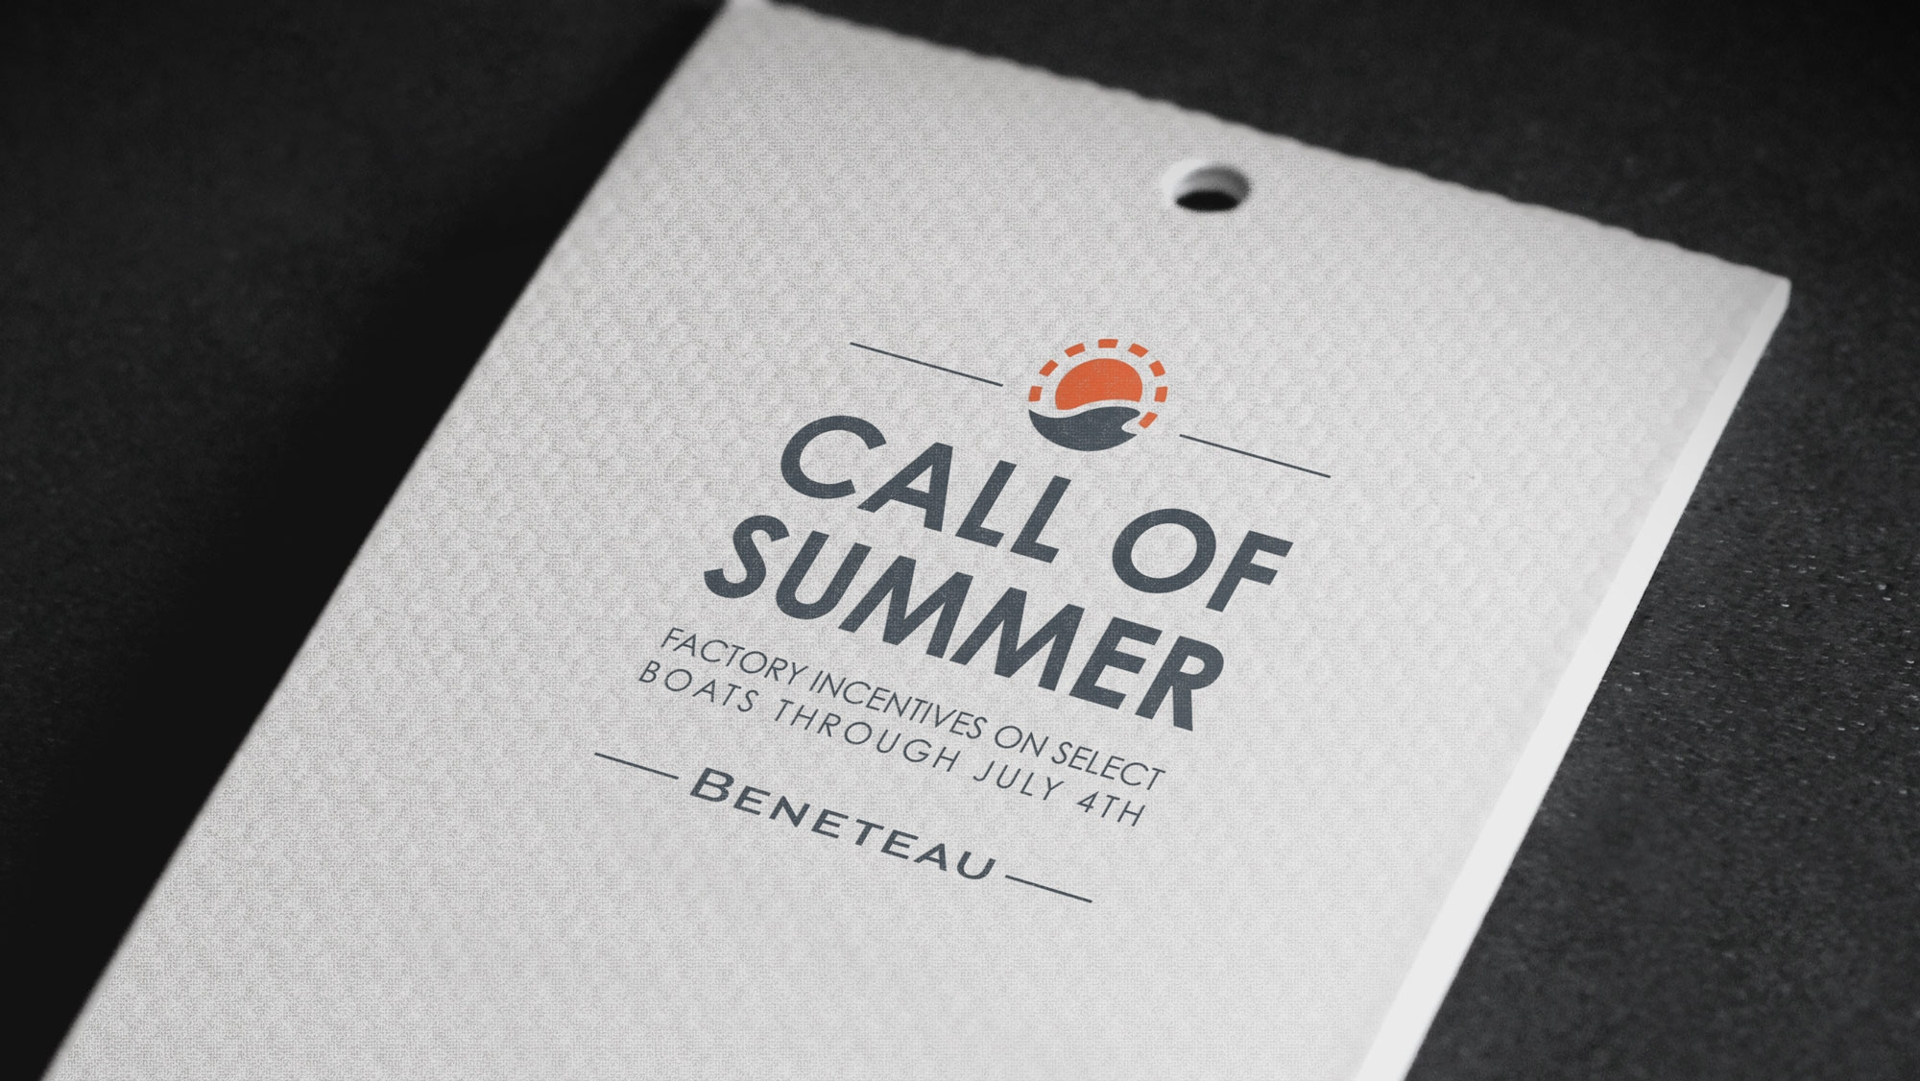 Call of Summer